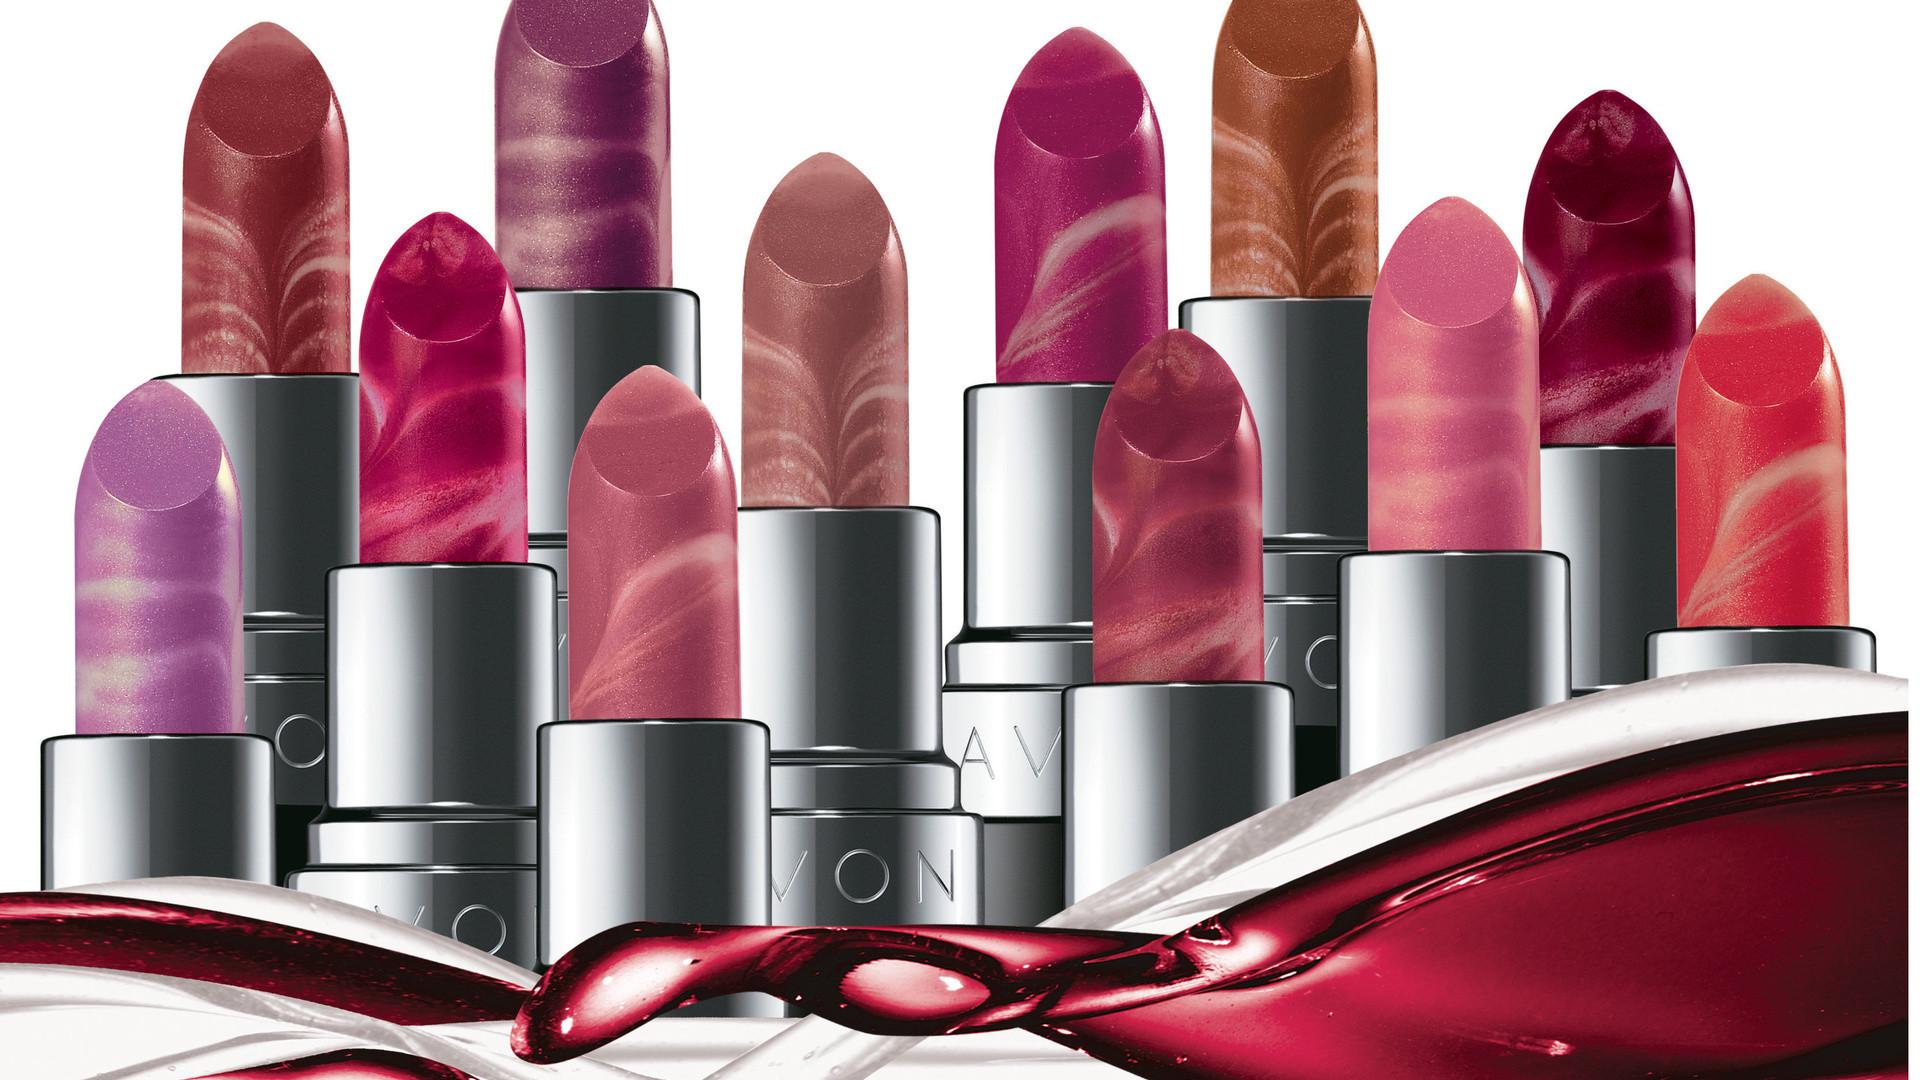 Res: 1920x1080, Avon, Cosmetics, Pomade, Lipsticks, Avon Cosmetics Lipsticks